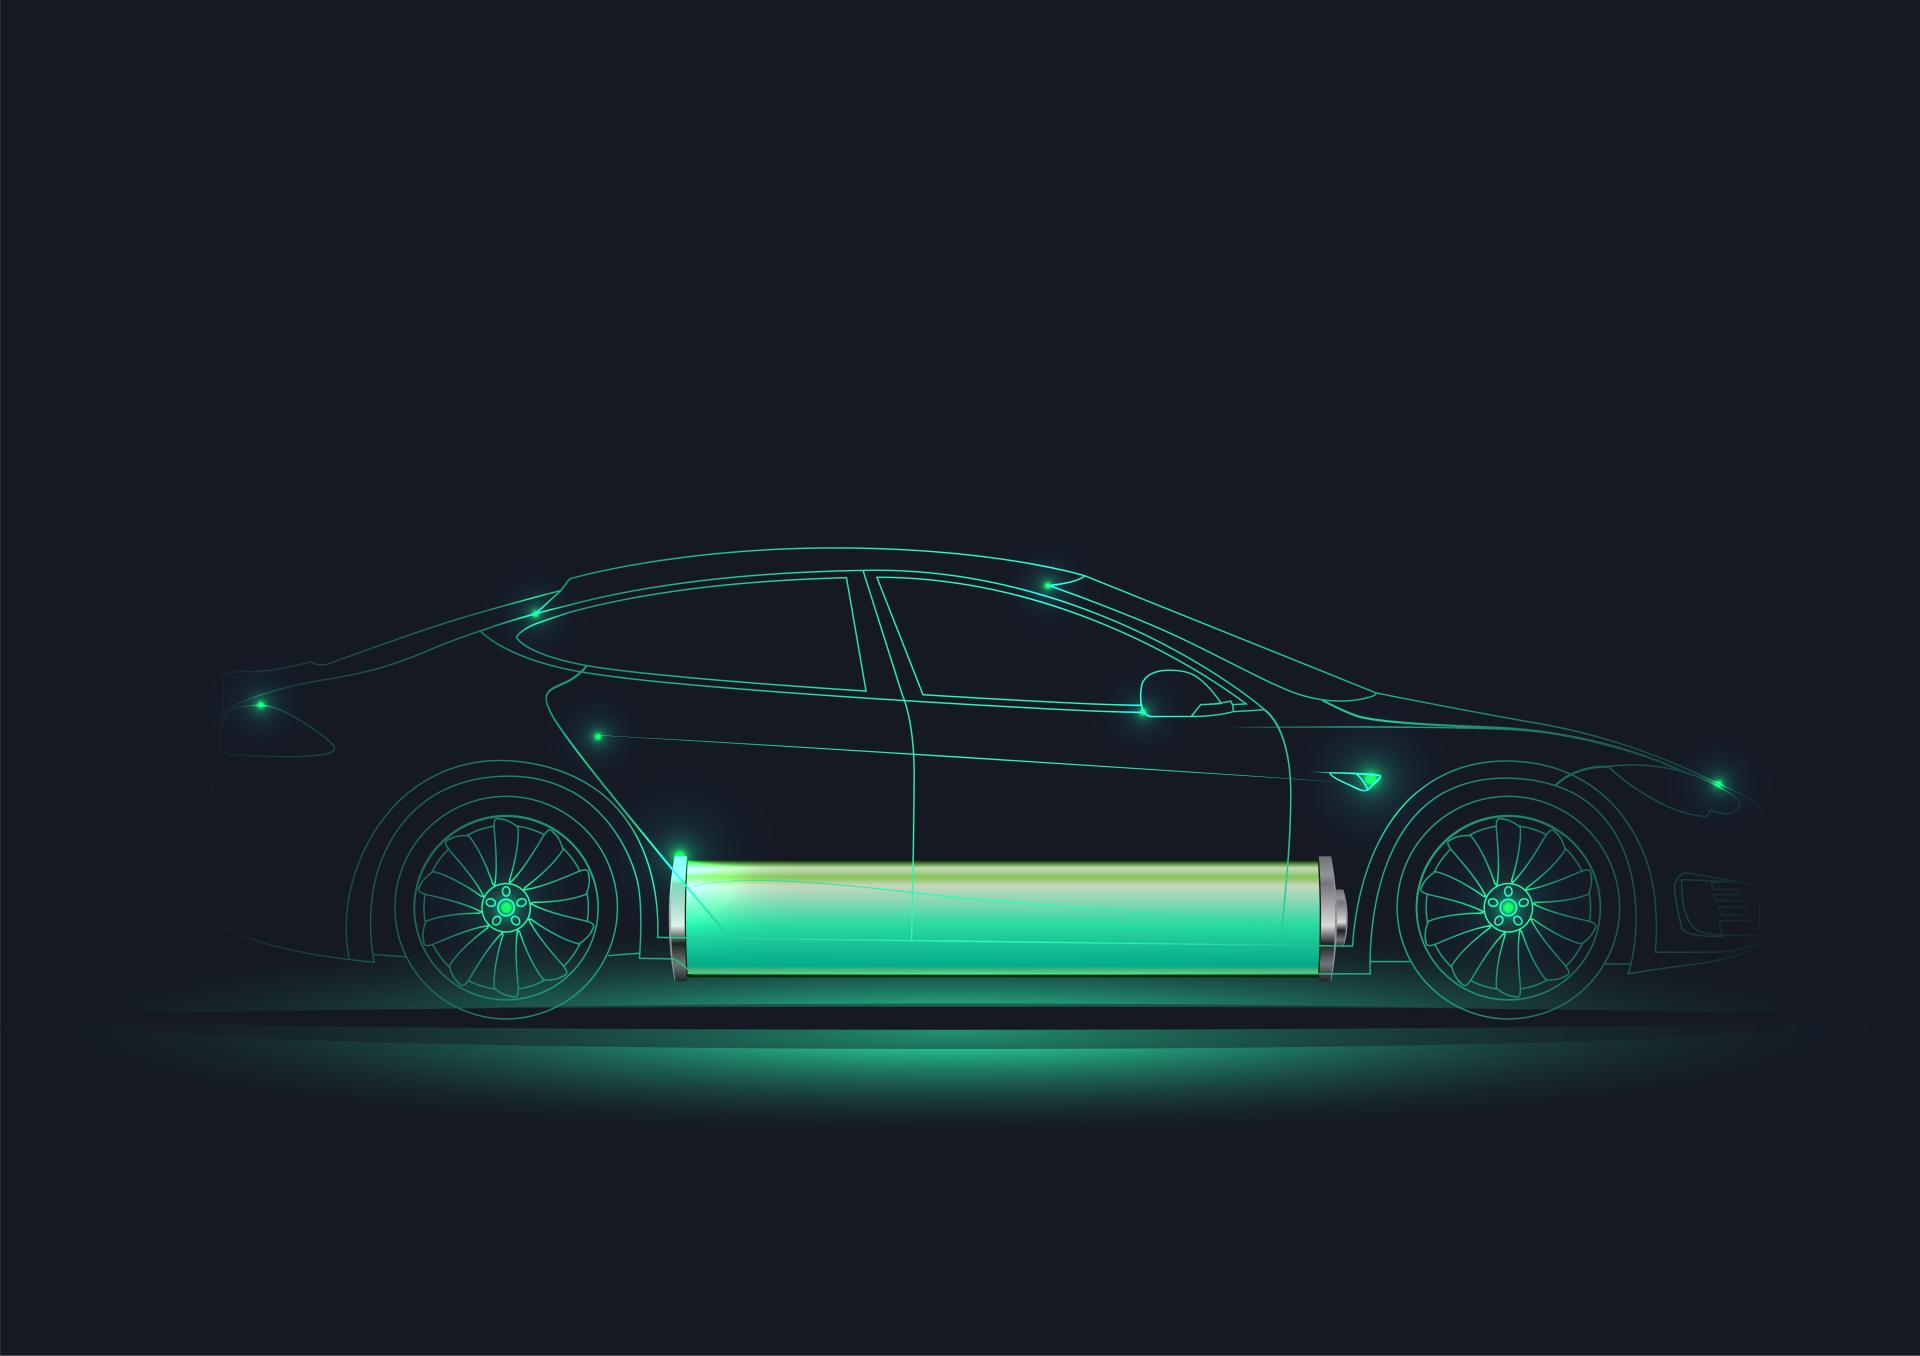 KIA, Hyundai und LG Chem planen Investitionen in E-Start-Ups